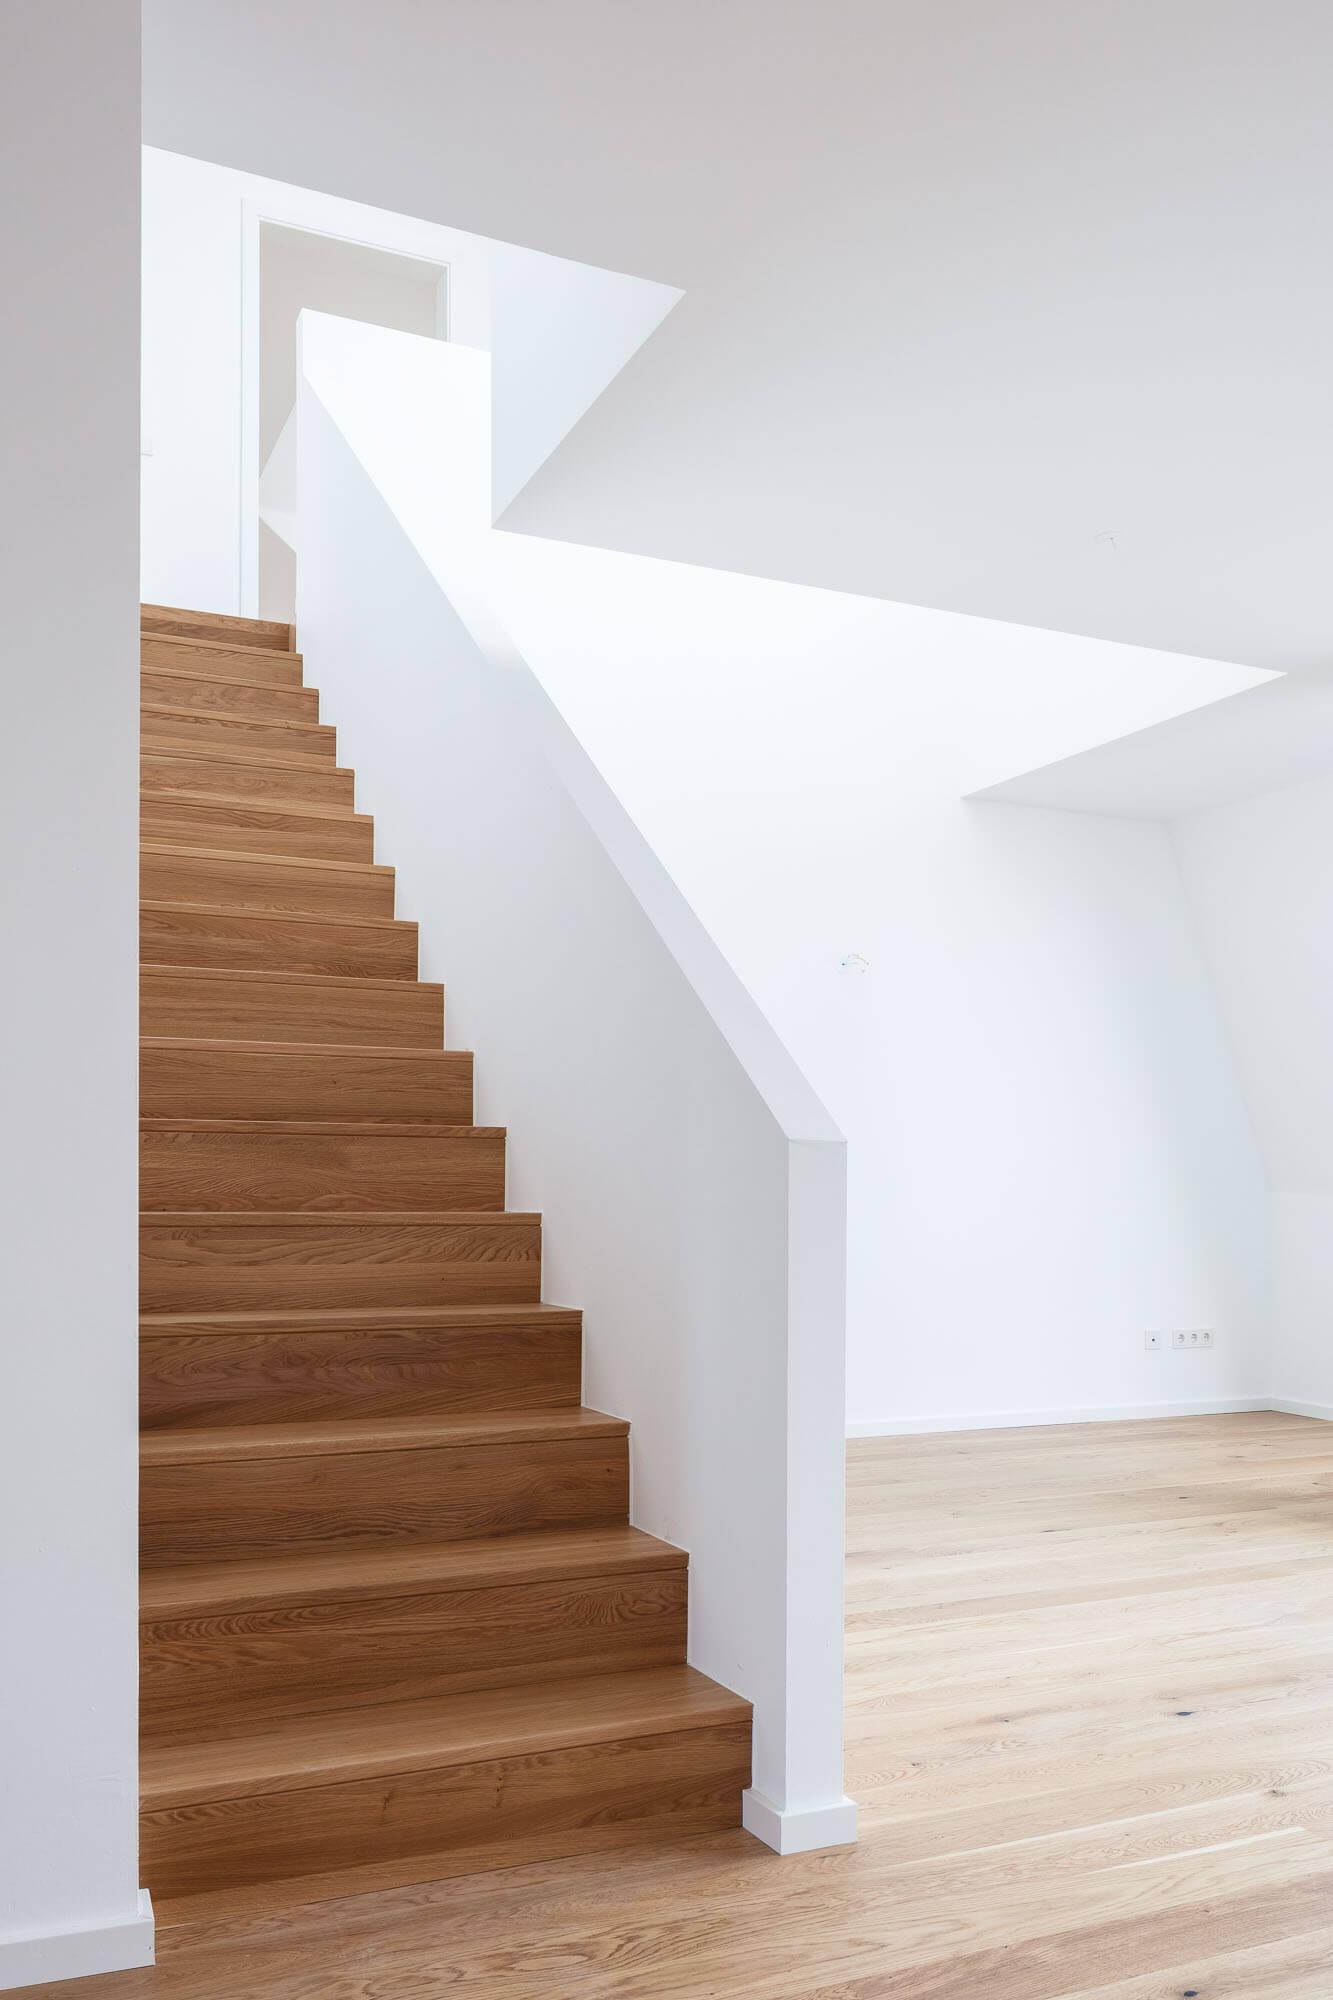 Interieurfotografie Treppe im Raum